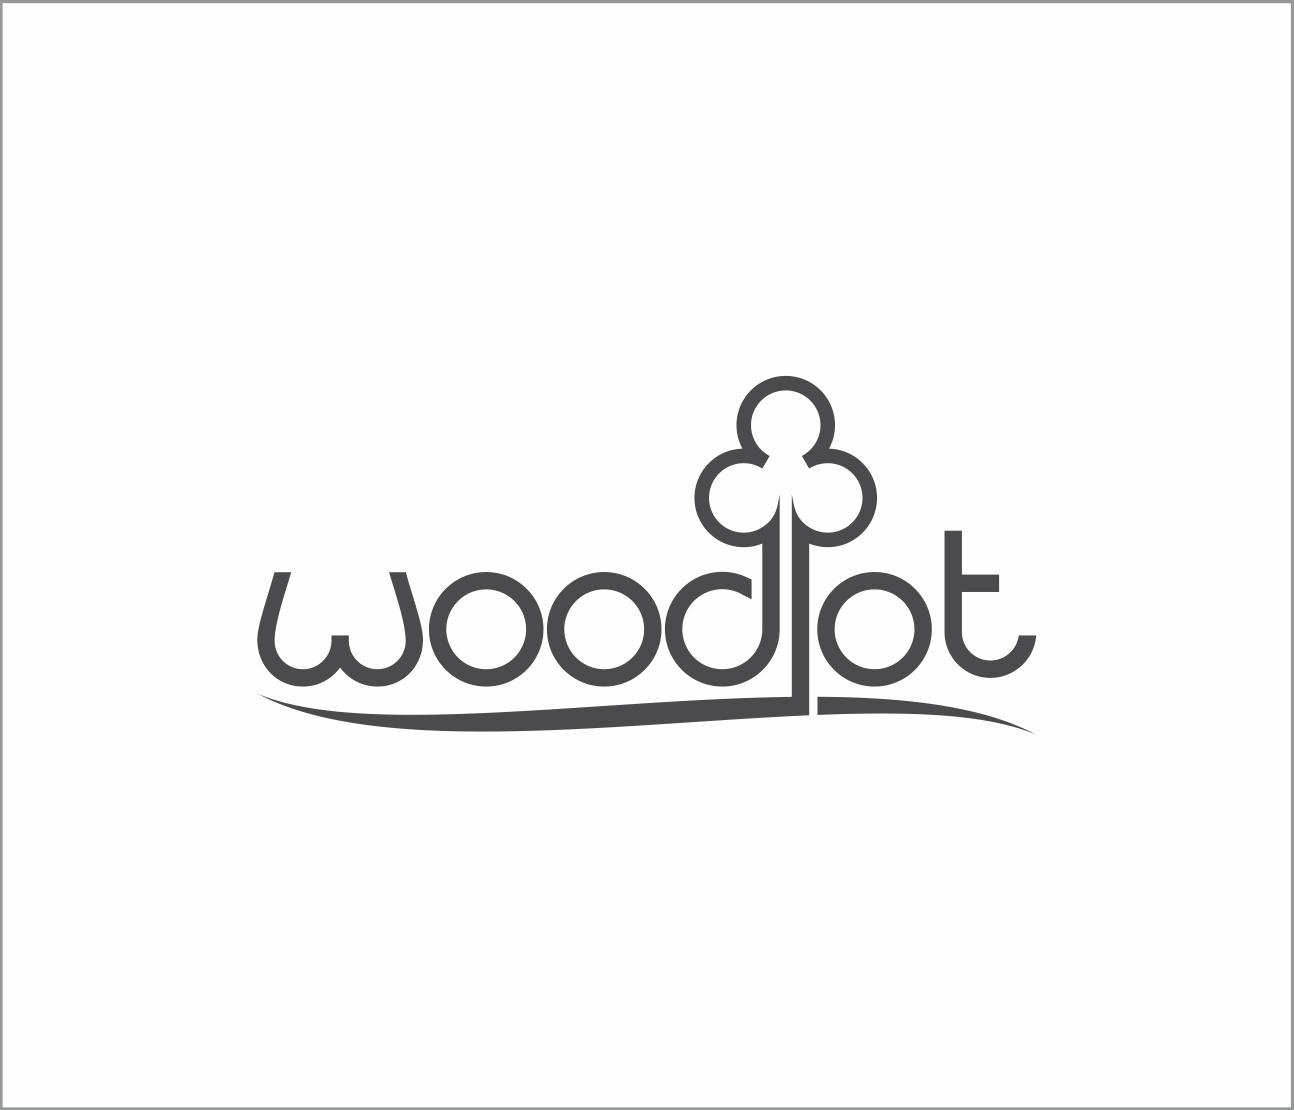 Logo Design by Armada Jamaluddin - Entry No. 83 in the Logo Design Contest Fun Logo Design for woodlot.